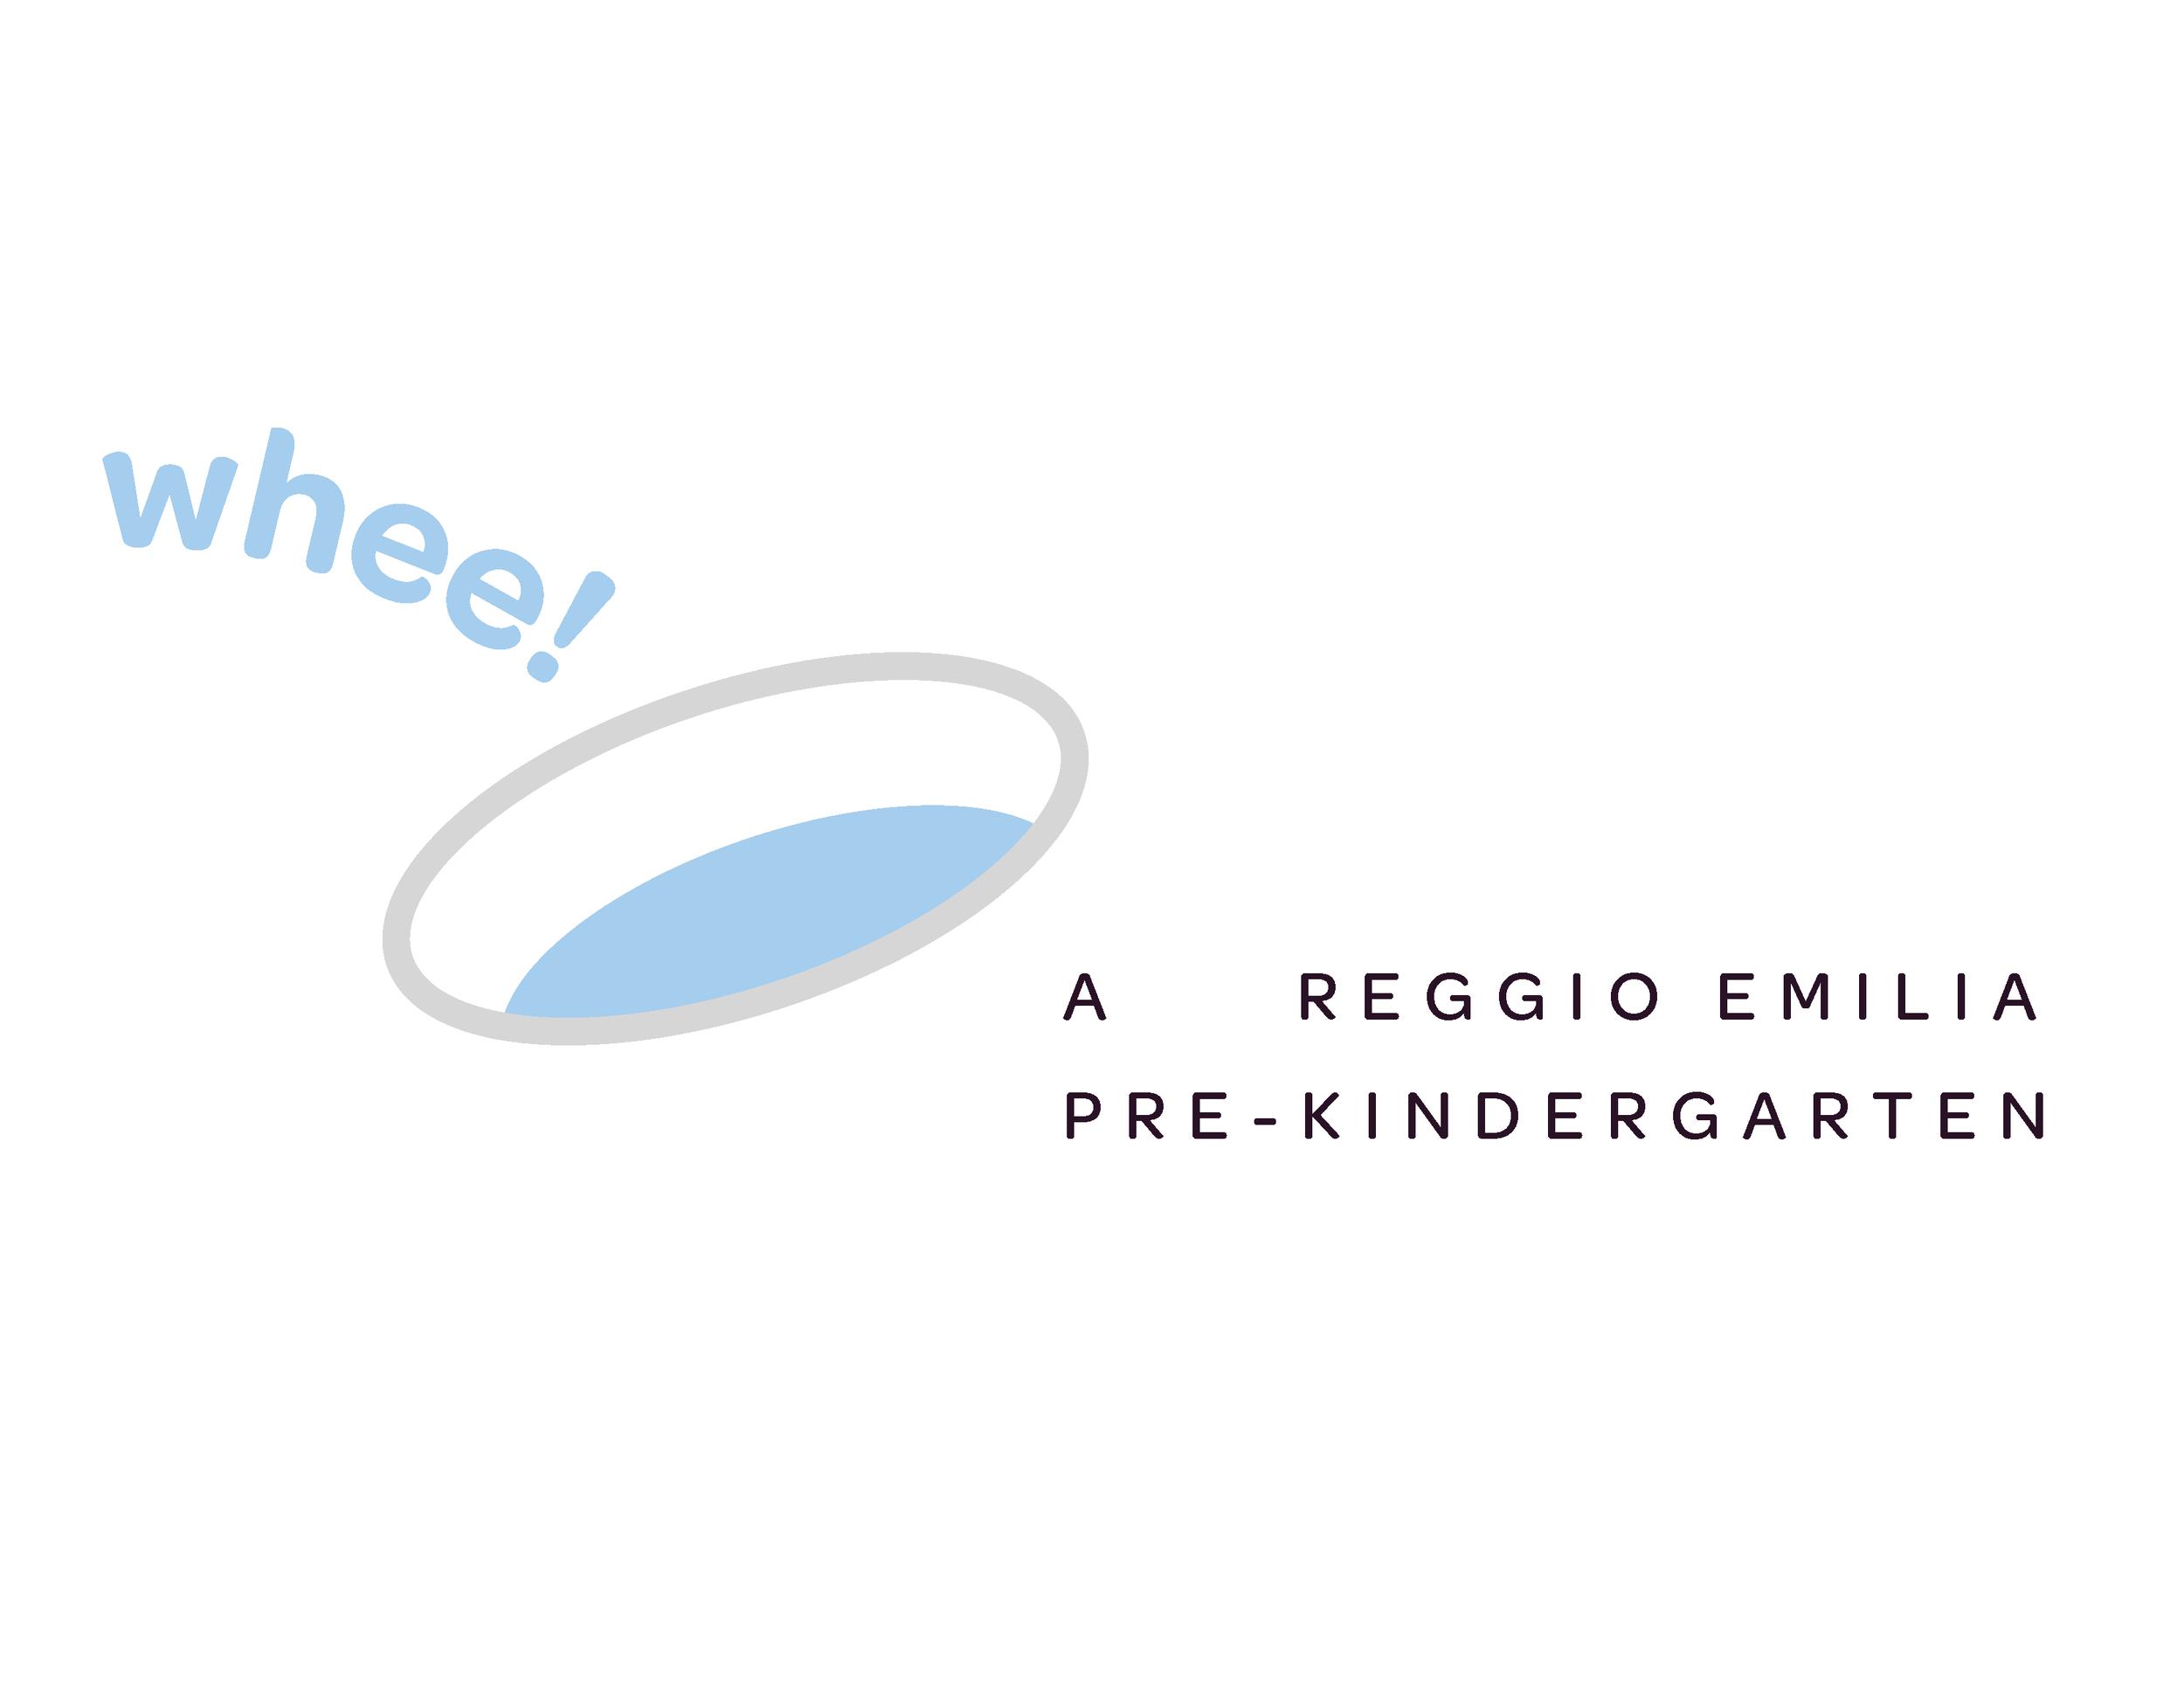 whee! logo 1-15.png